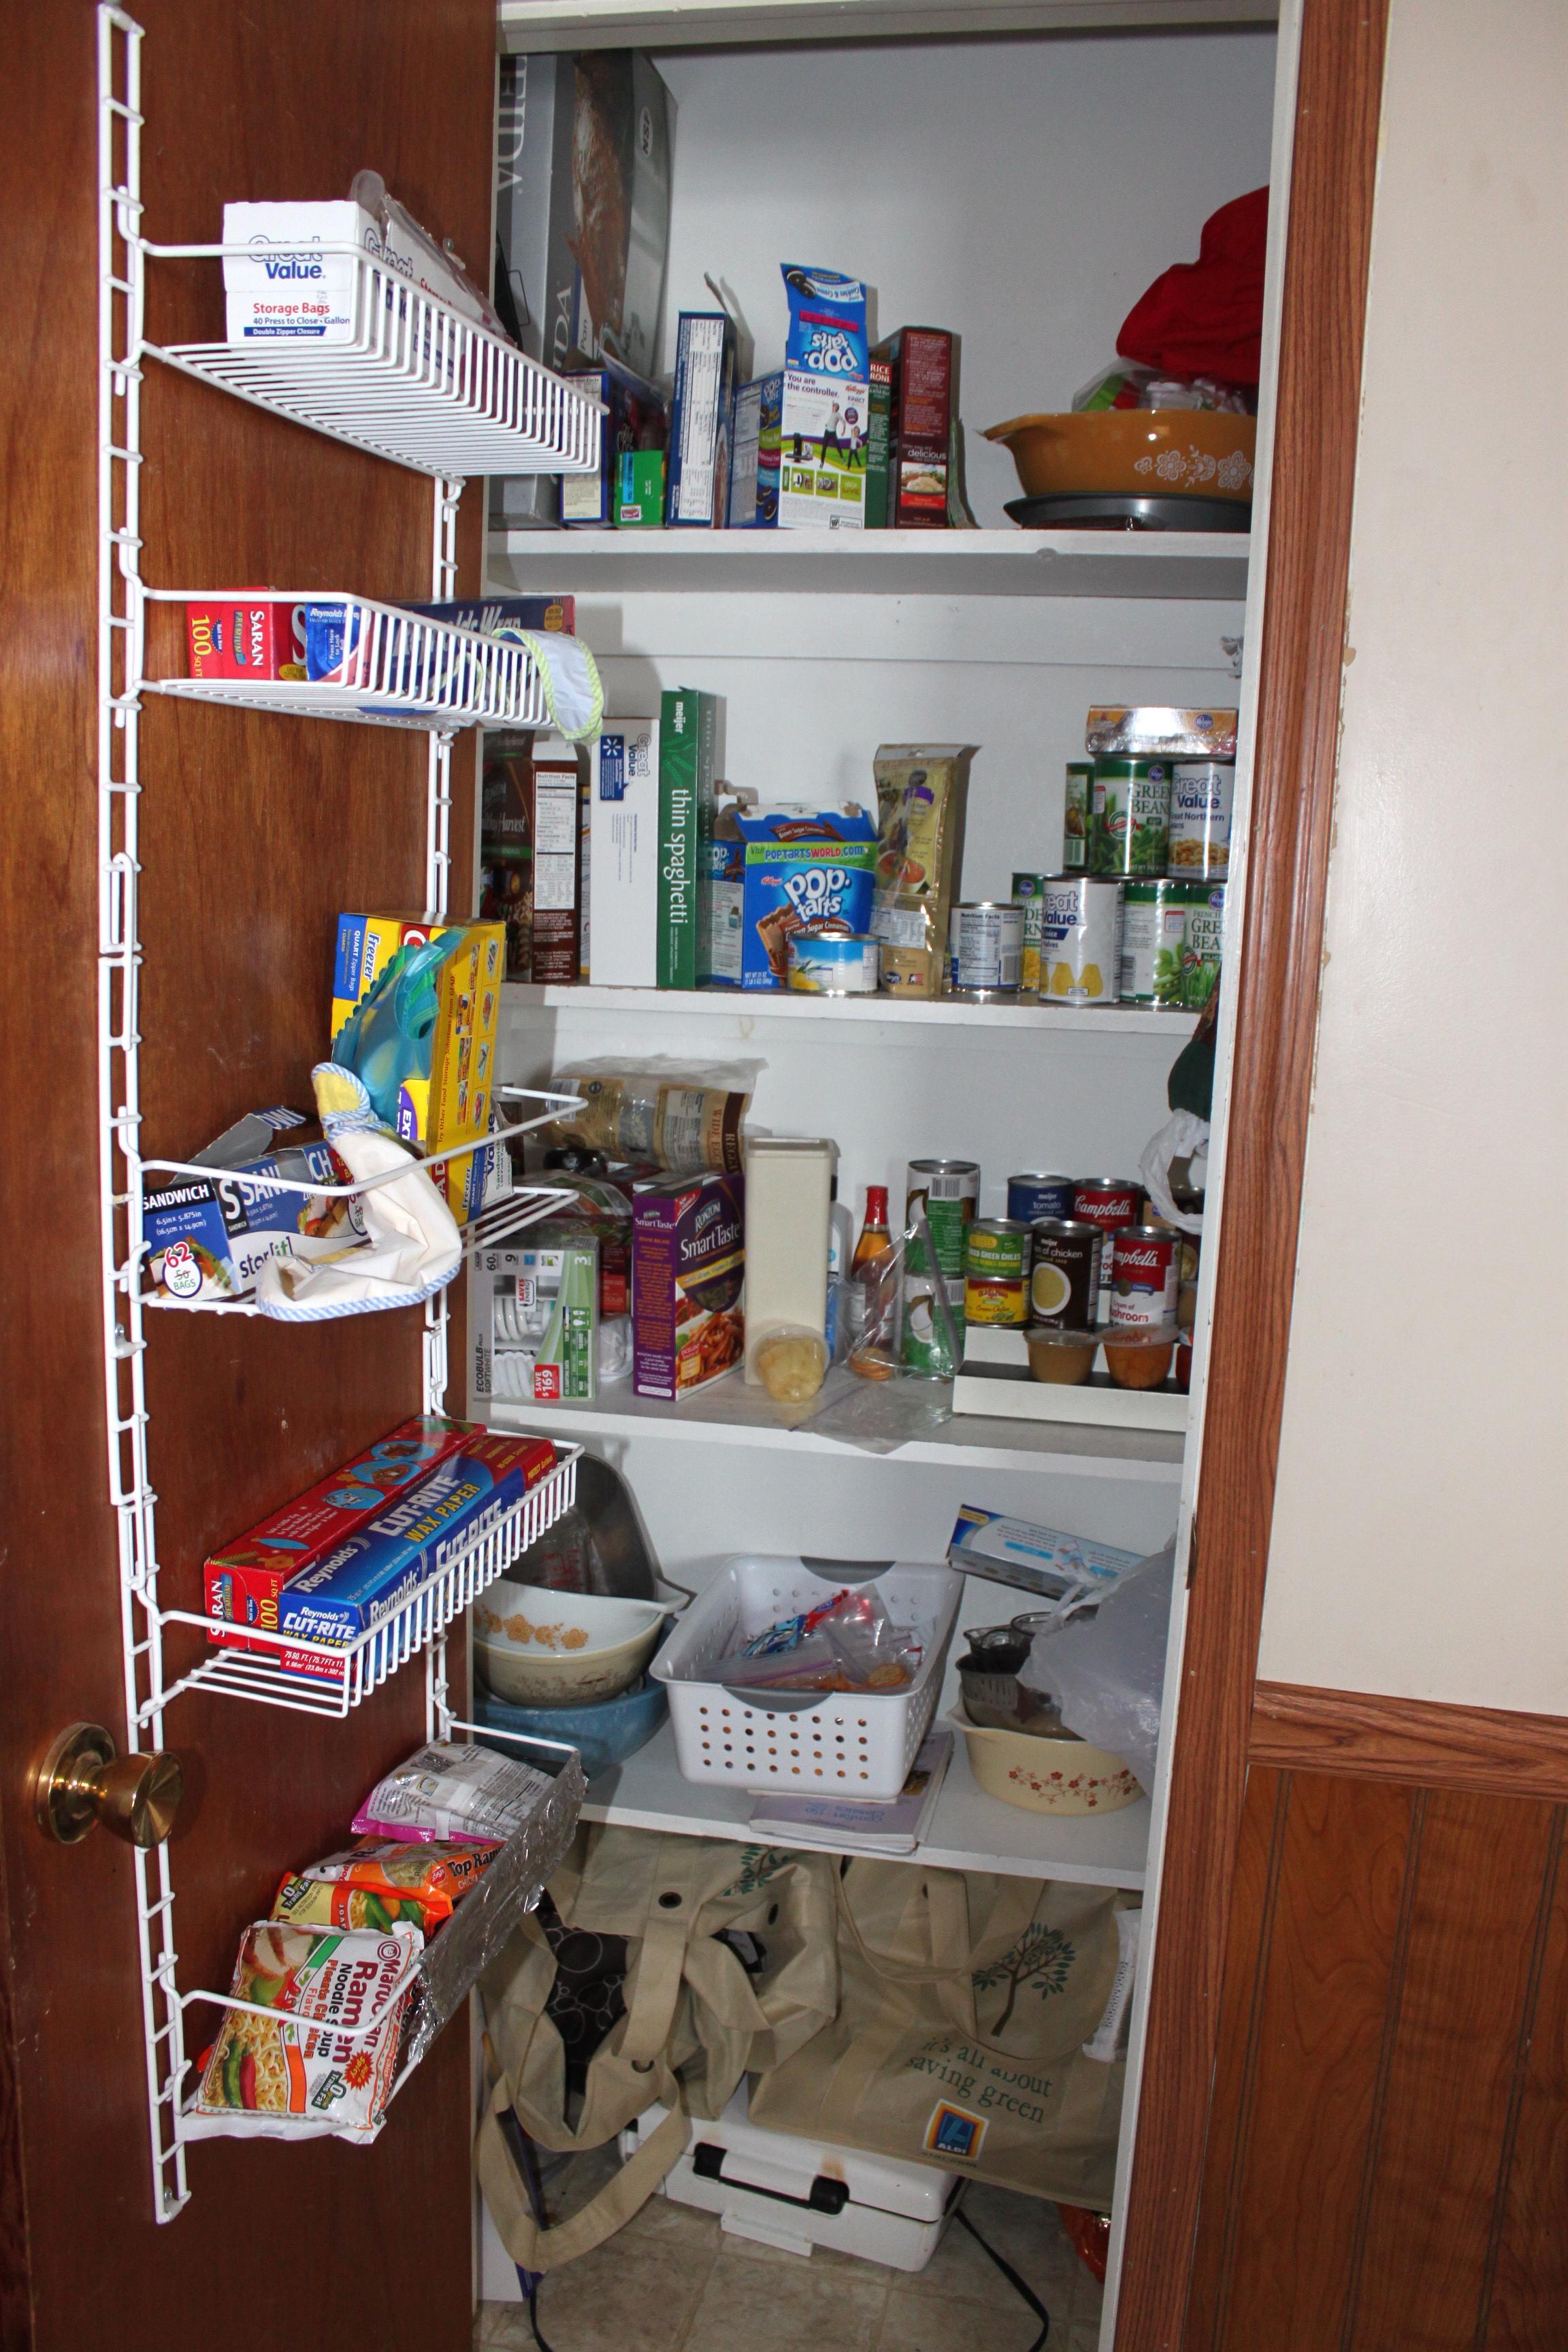 Becoming More Domestic Becoming More Domestic